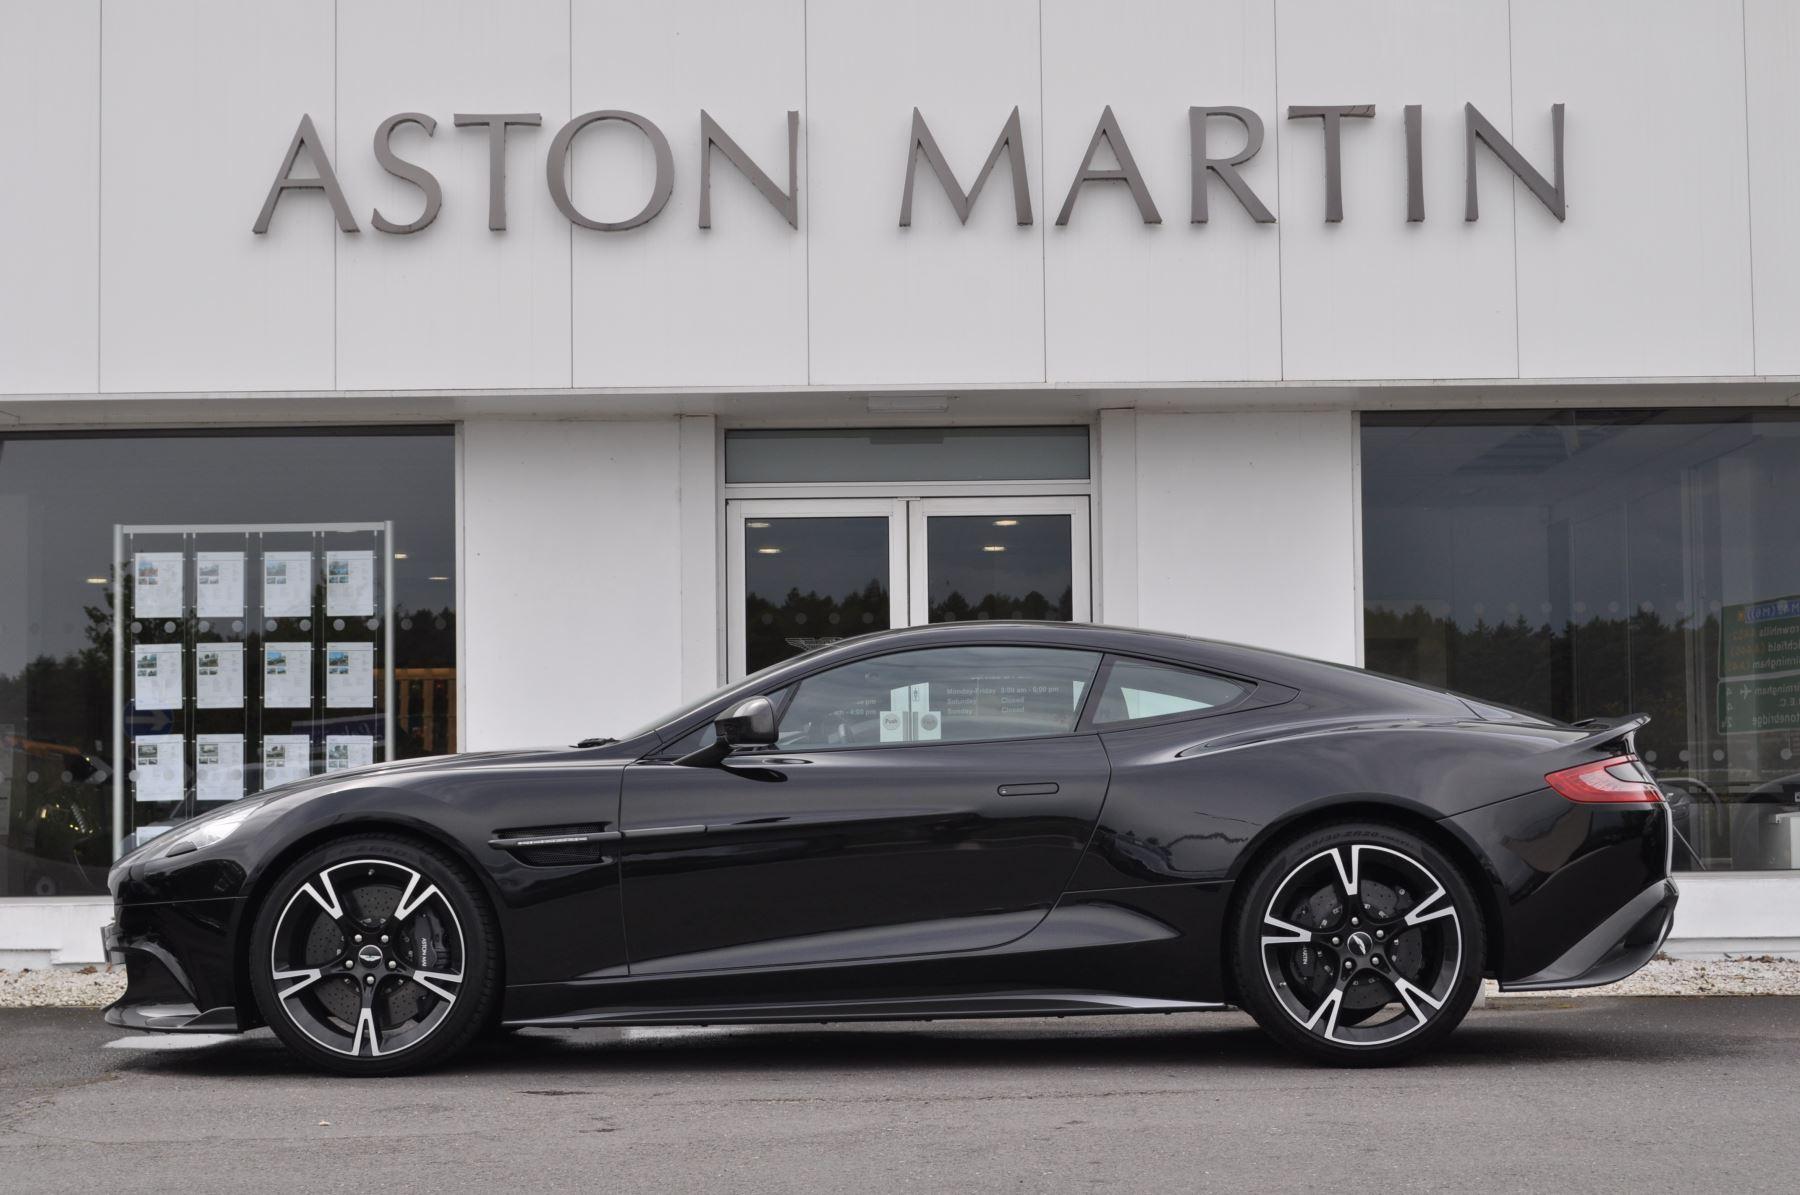 Aston Martin Vanquish S V12 [595] S 2+2 2dr Touchtronic image 8